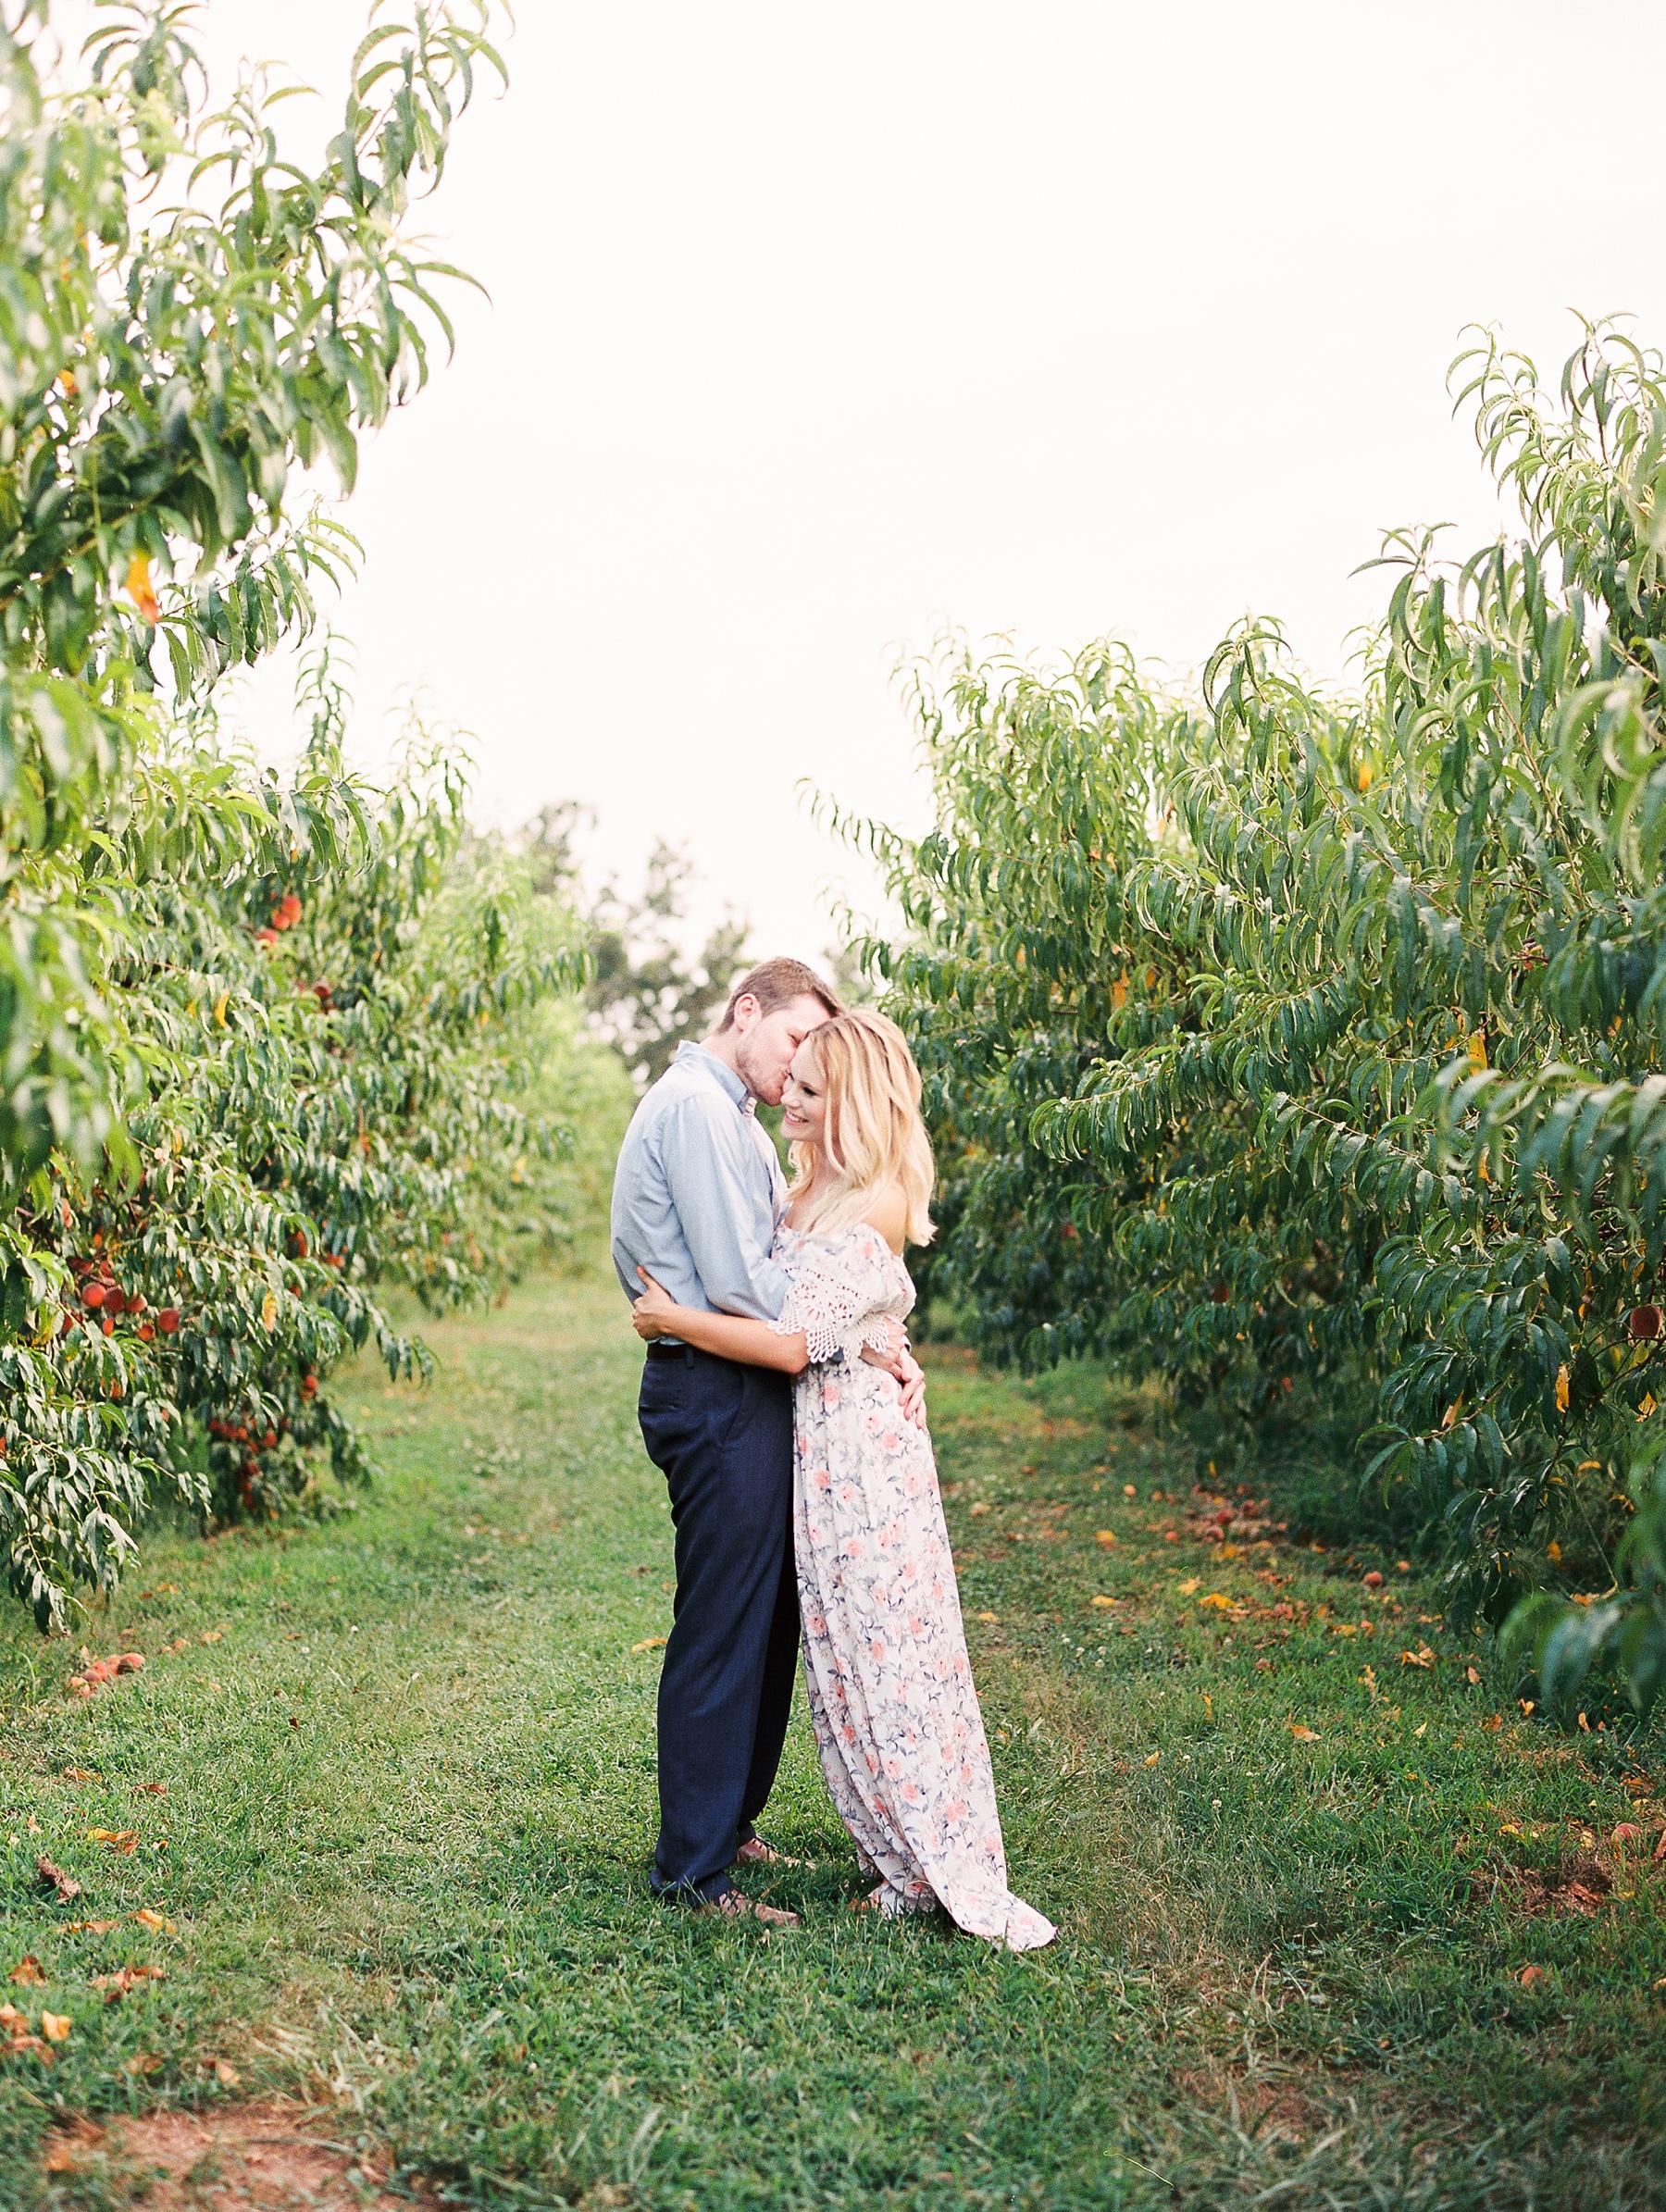 Peach-Orchard-Engagement-Session-Arkansas_0008.jpg